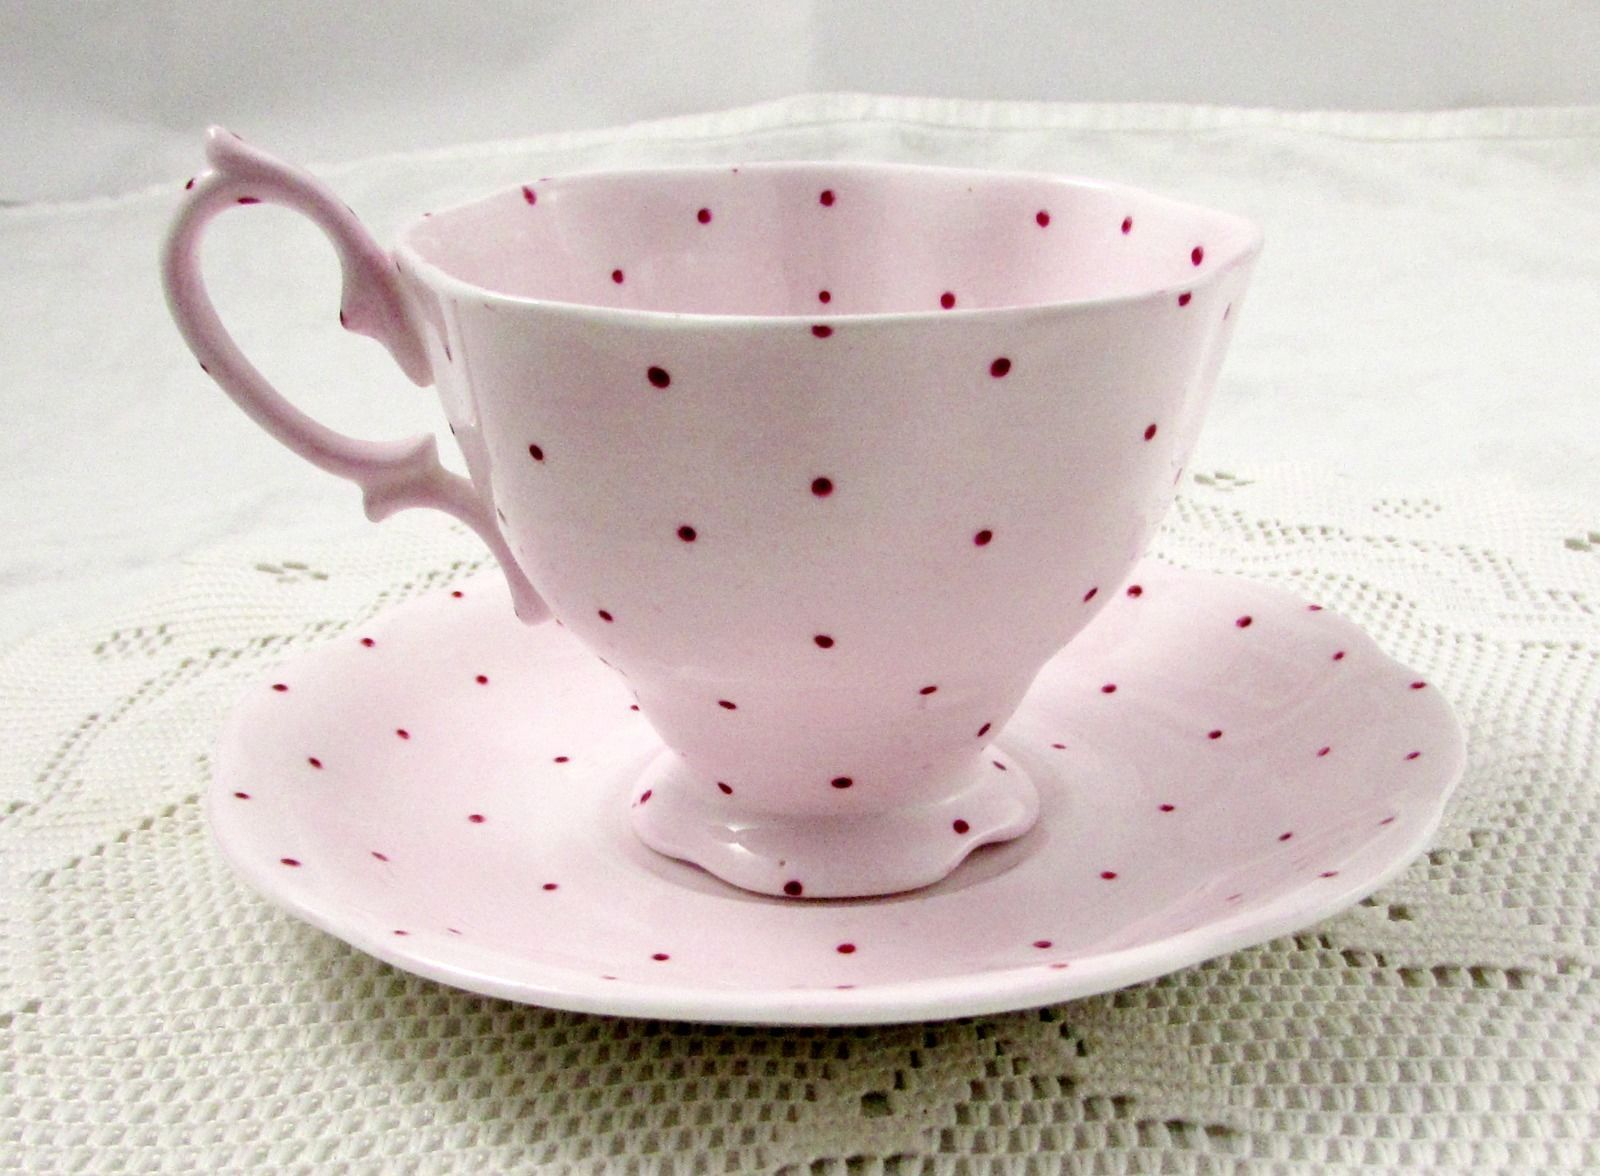 Royal Albert Pink Polka Dot Tea Cup And Saucer Vintage Royal Albert Ebay Vaisselle Service A The Art De La Table